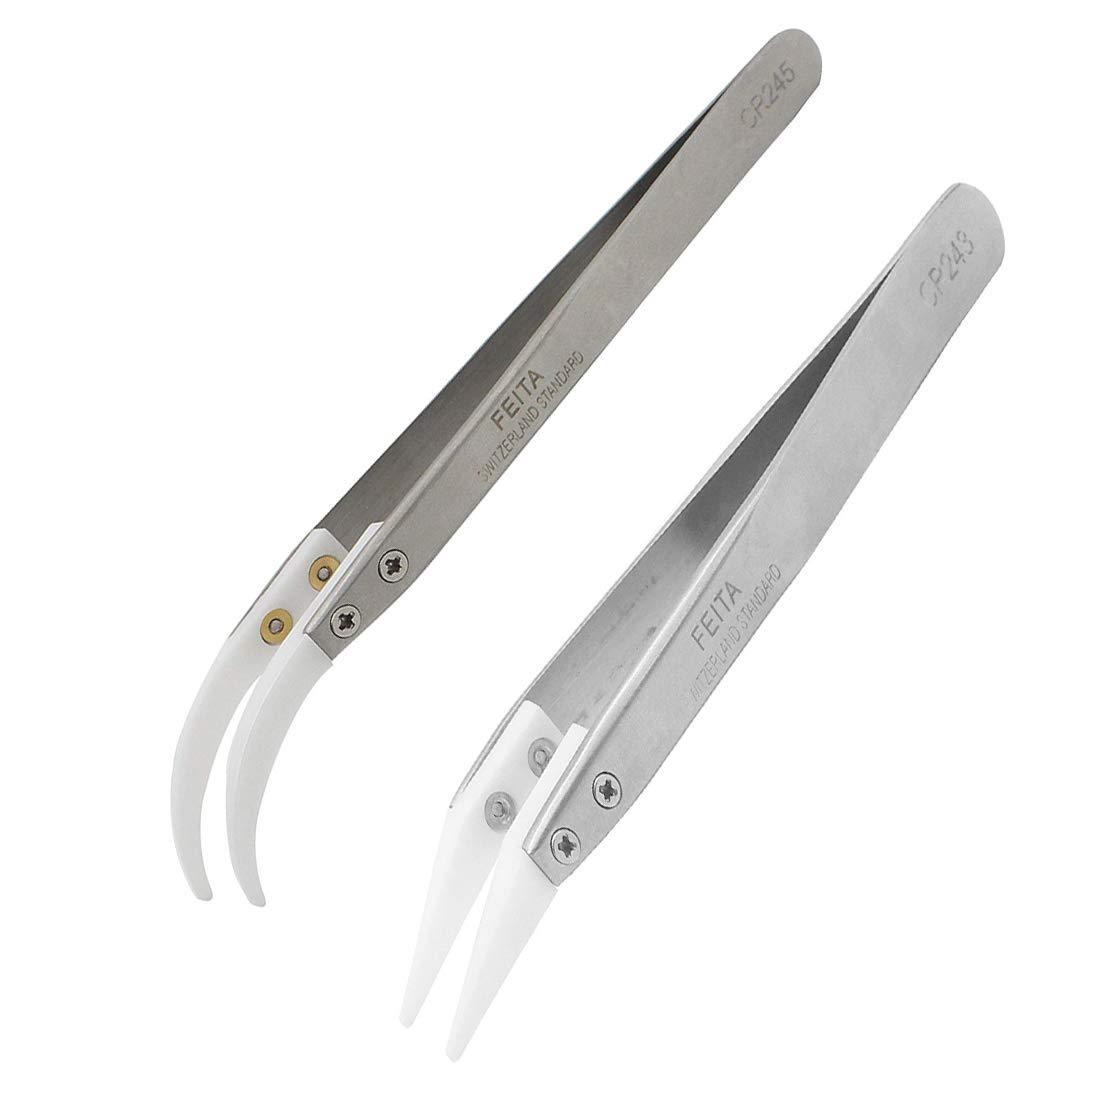 FEITA Ceramic Tweezer Set Ceramic Precision Tweezers for Vaping, Coil Master, Hobbies - NO More Broken Tips! ( 2-Pcs) by FEITA